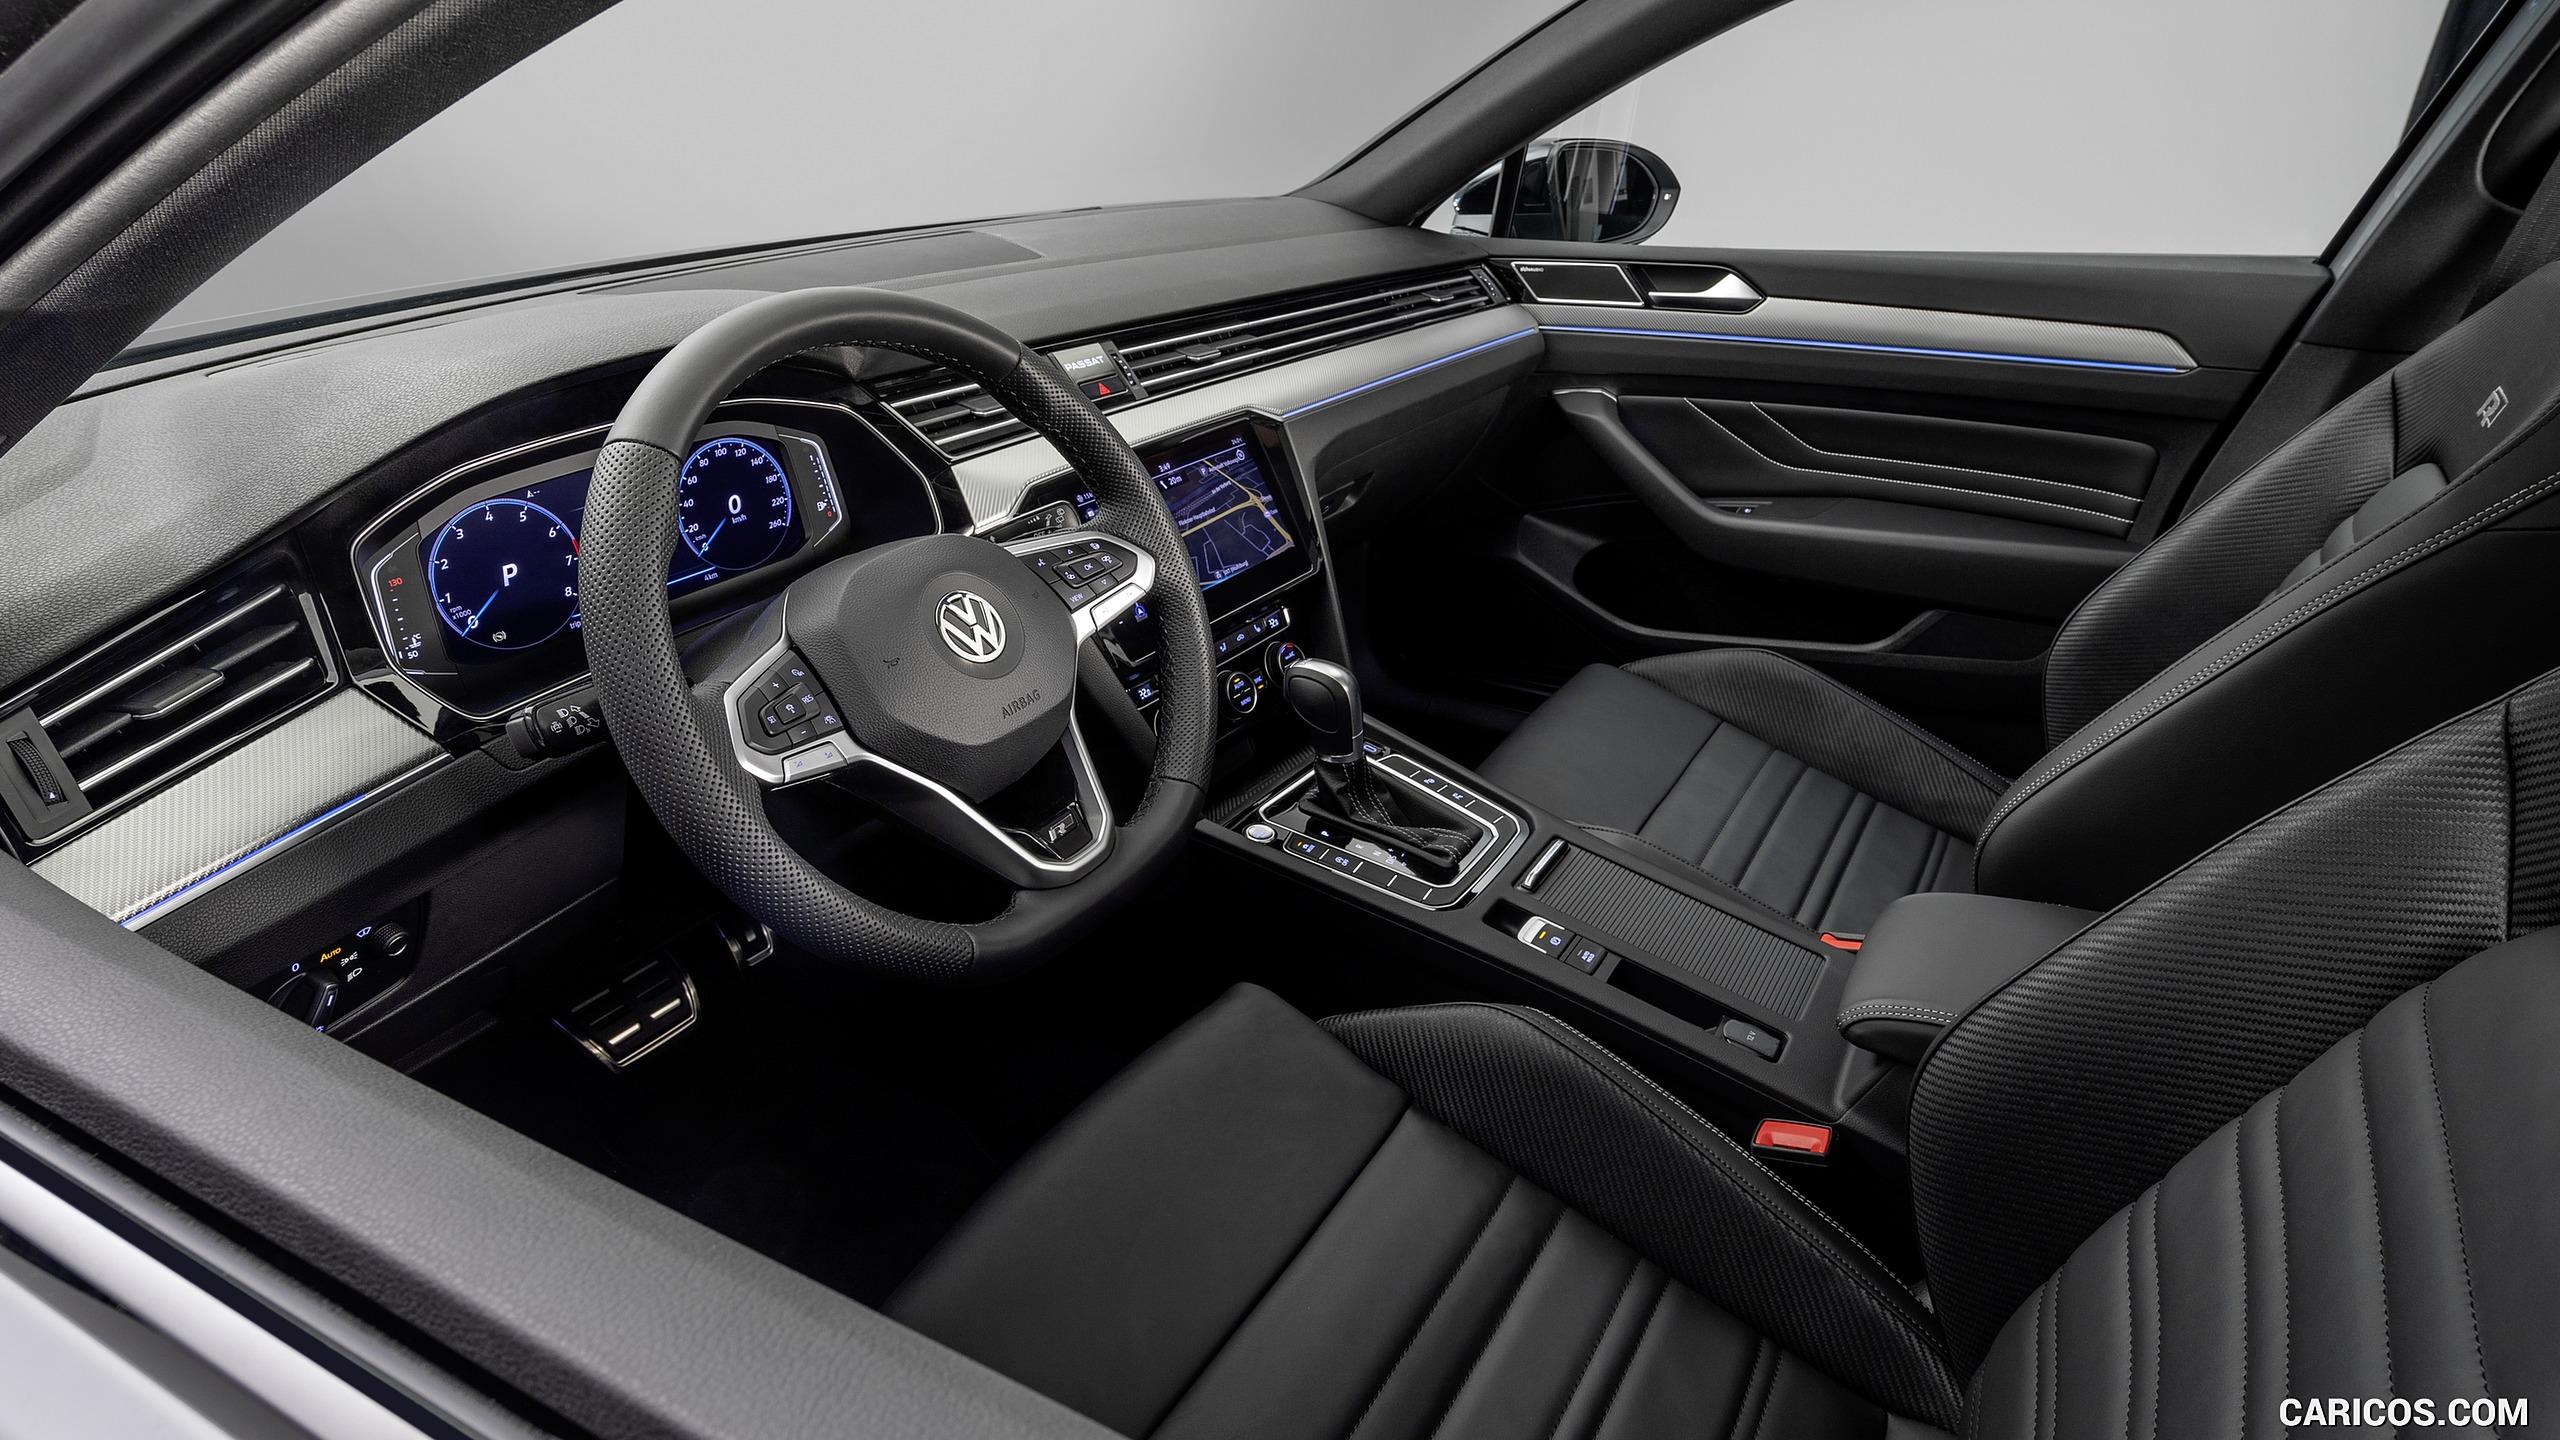 2019 Volkswagen Passat Variant R Line Edition EU Spec   Interior 2560x1440